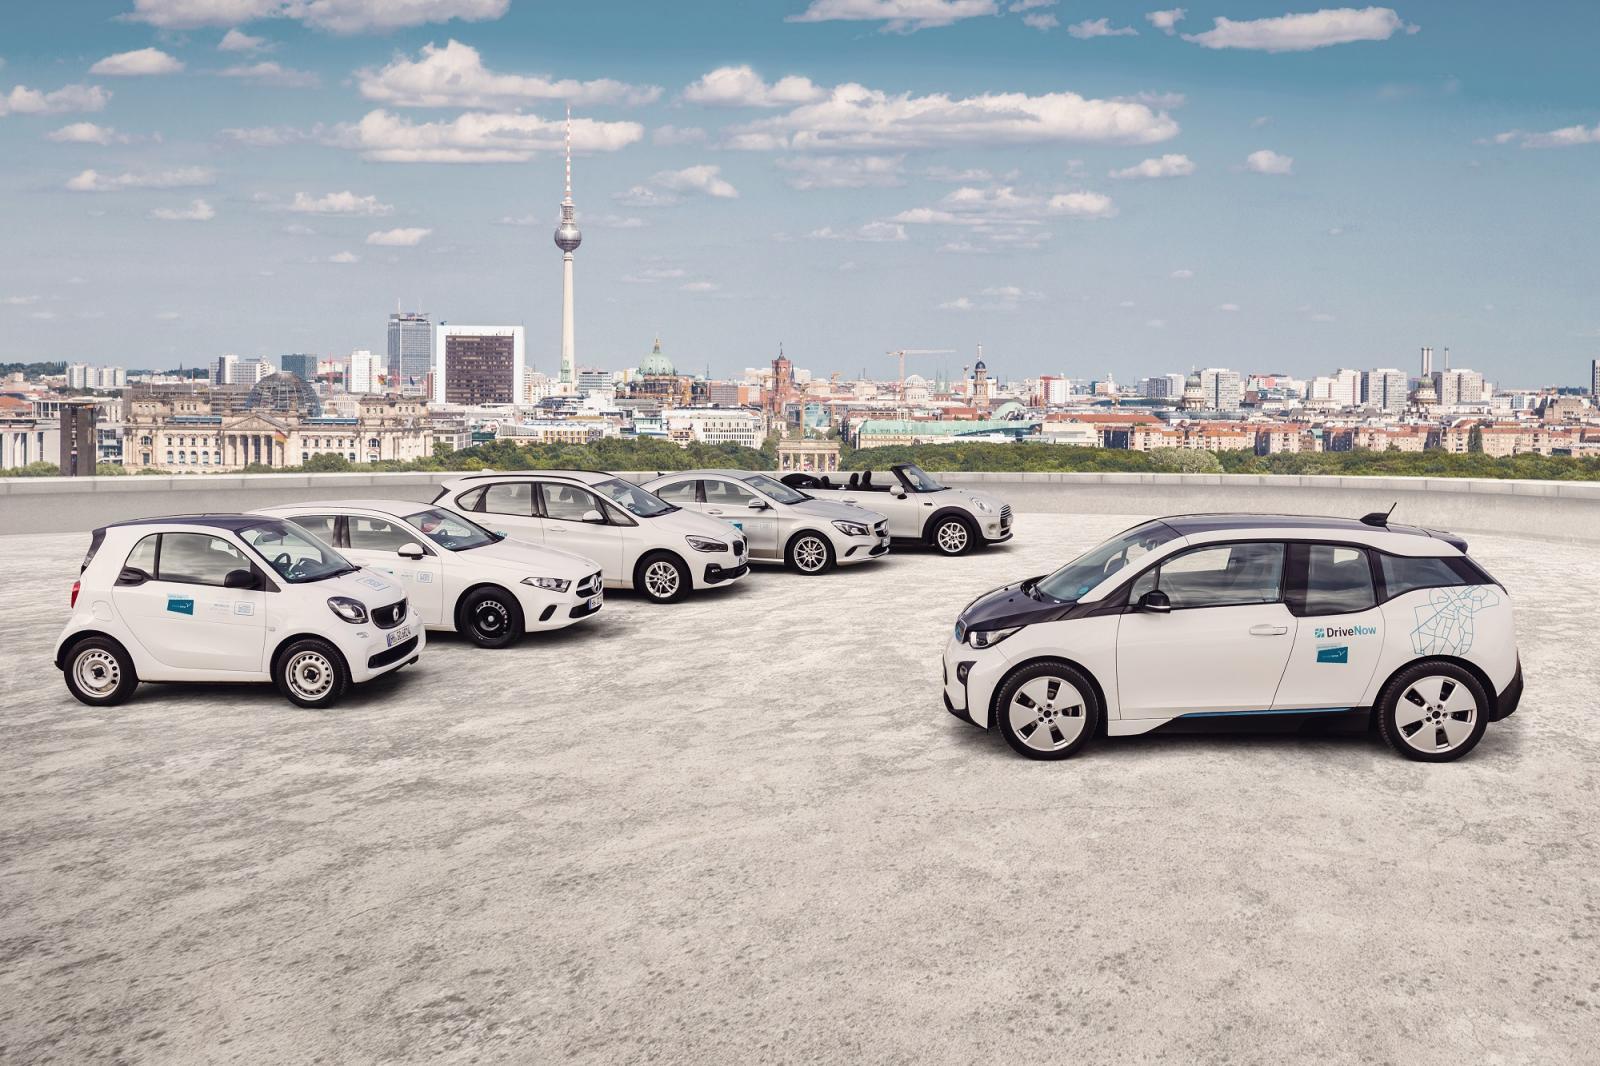 DriveNow_KITT_Munich_Fleet_BMW_i3 - Kopie